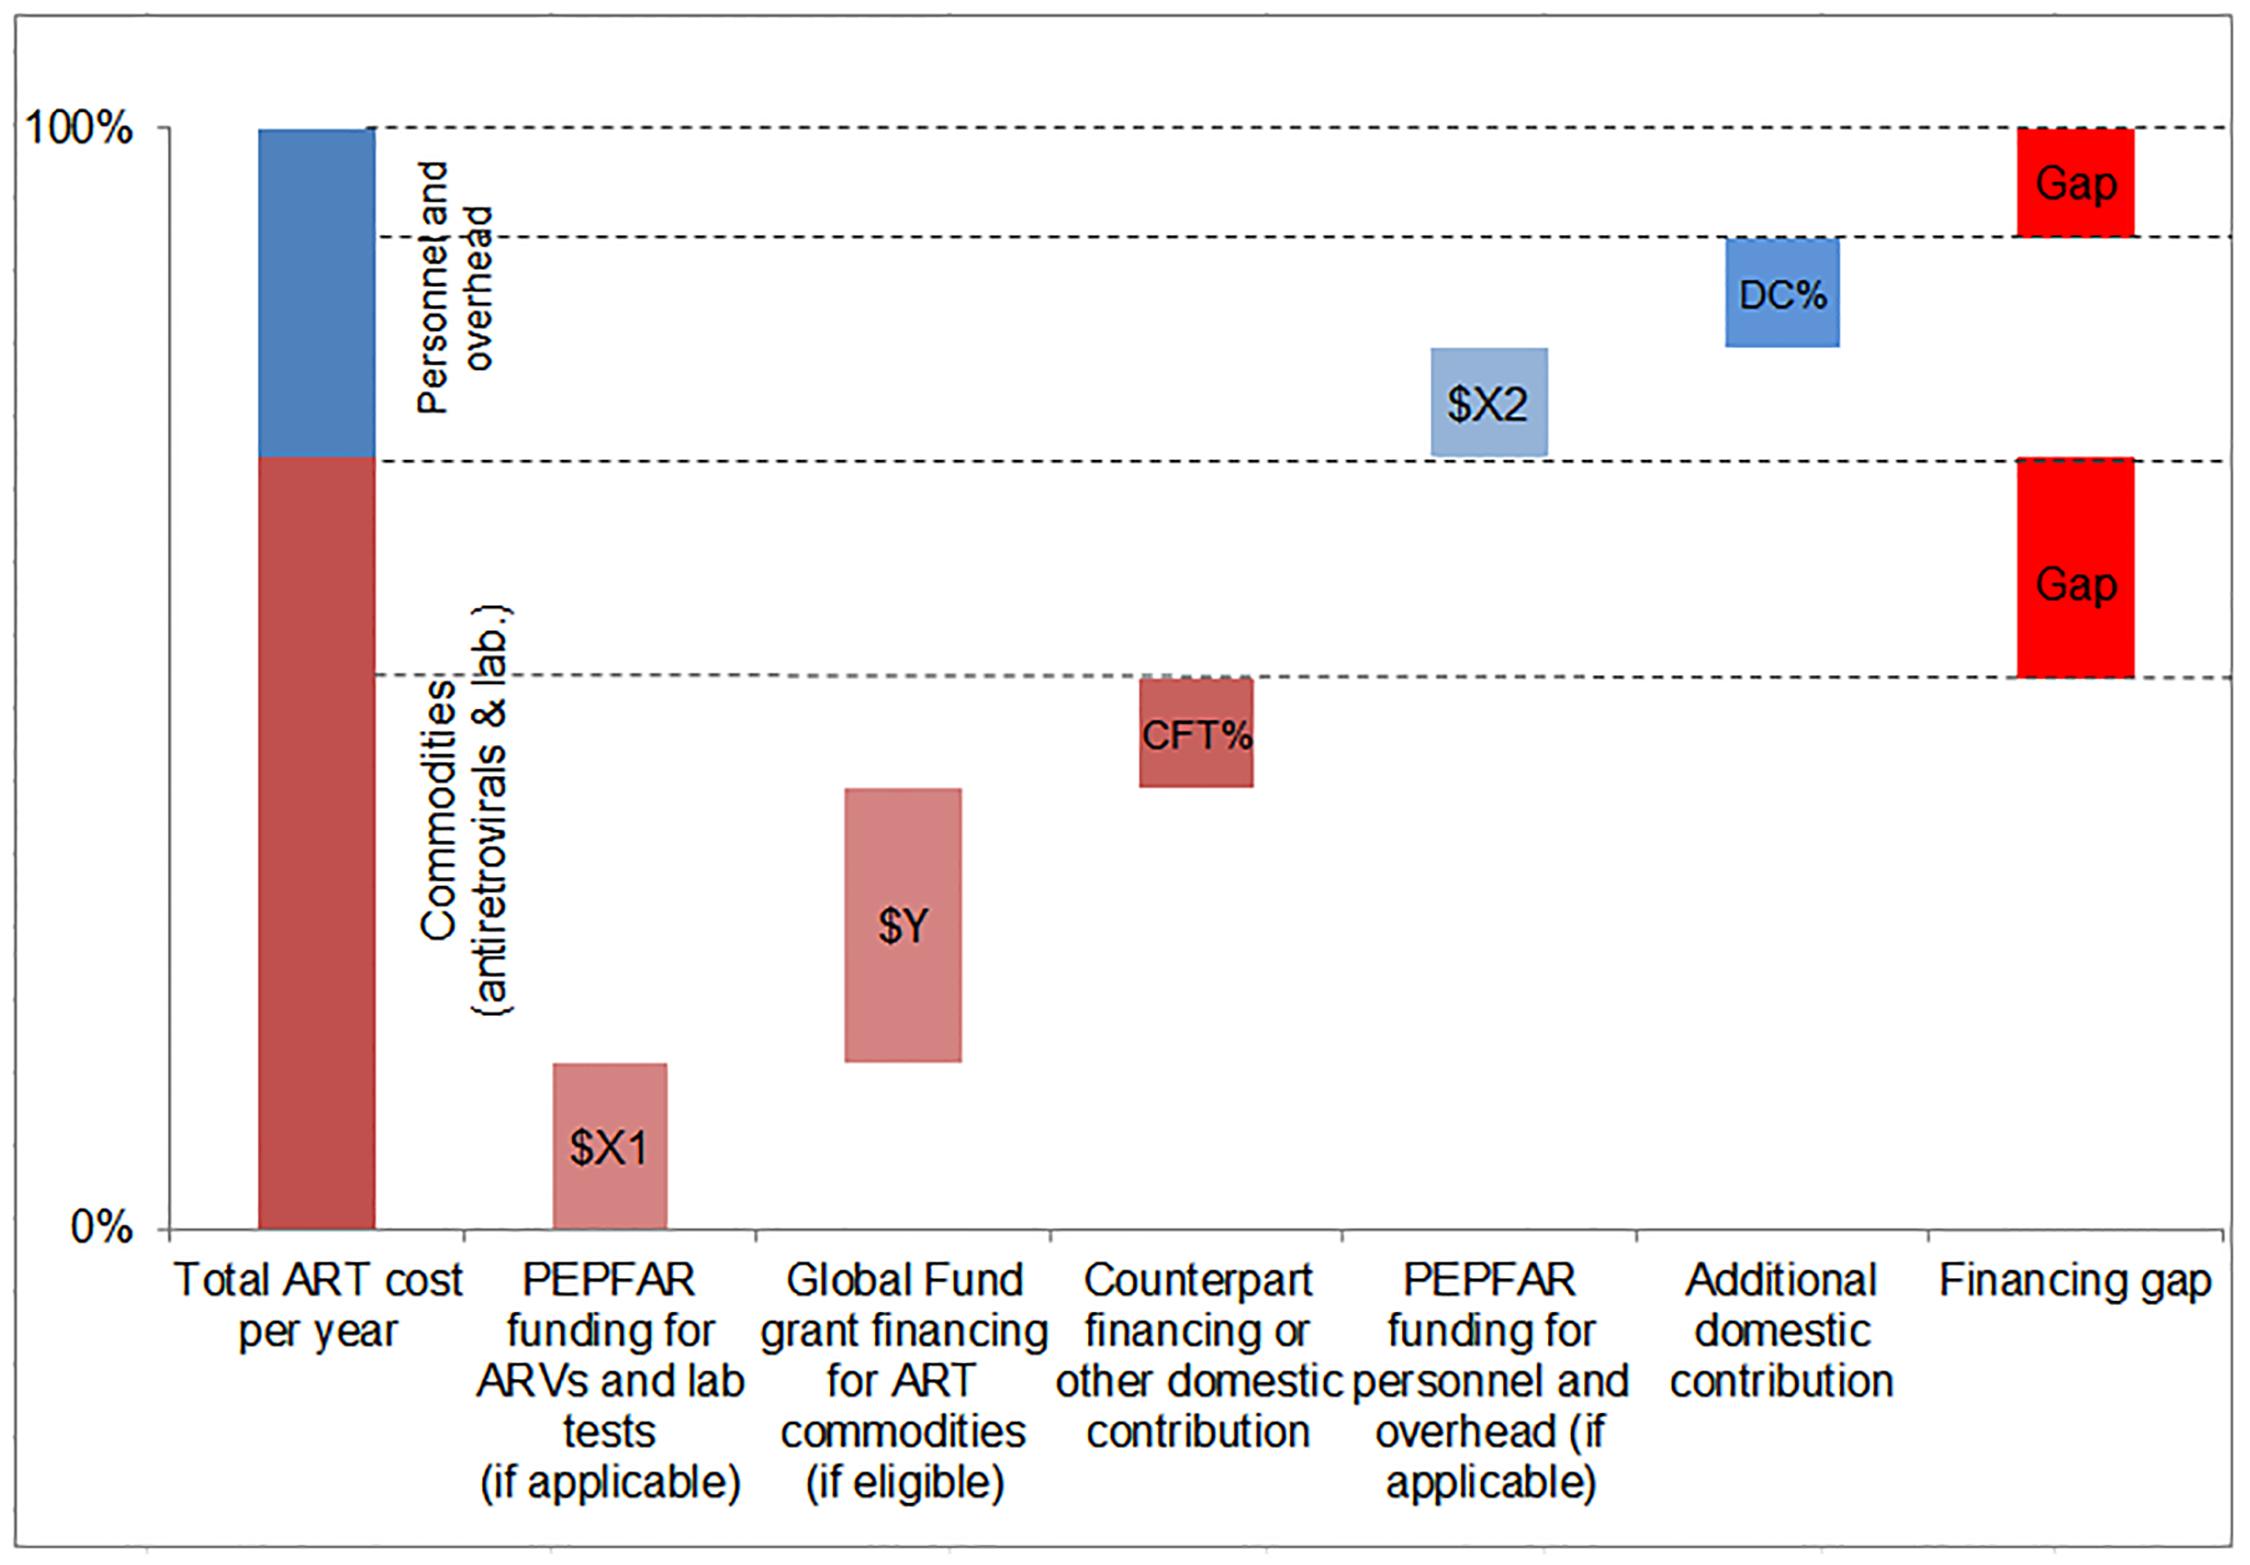 Estimating the funding gap.